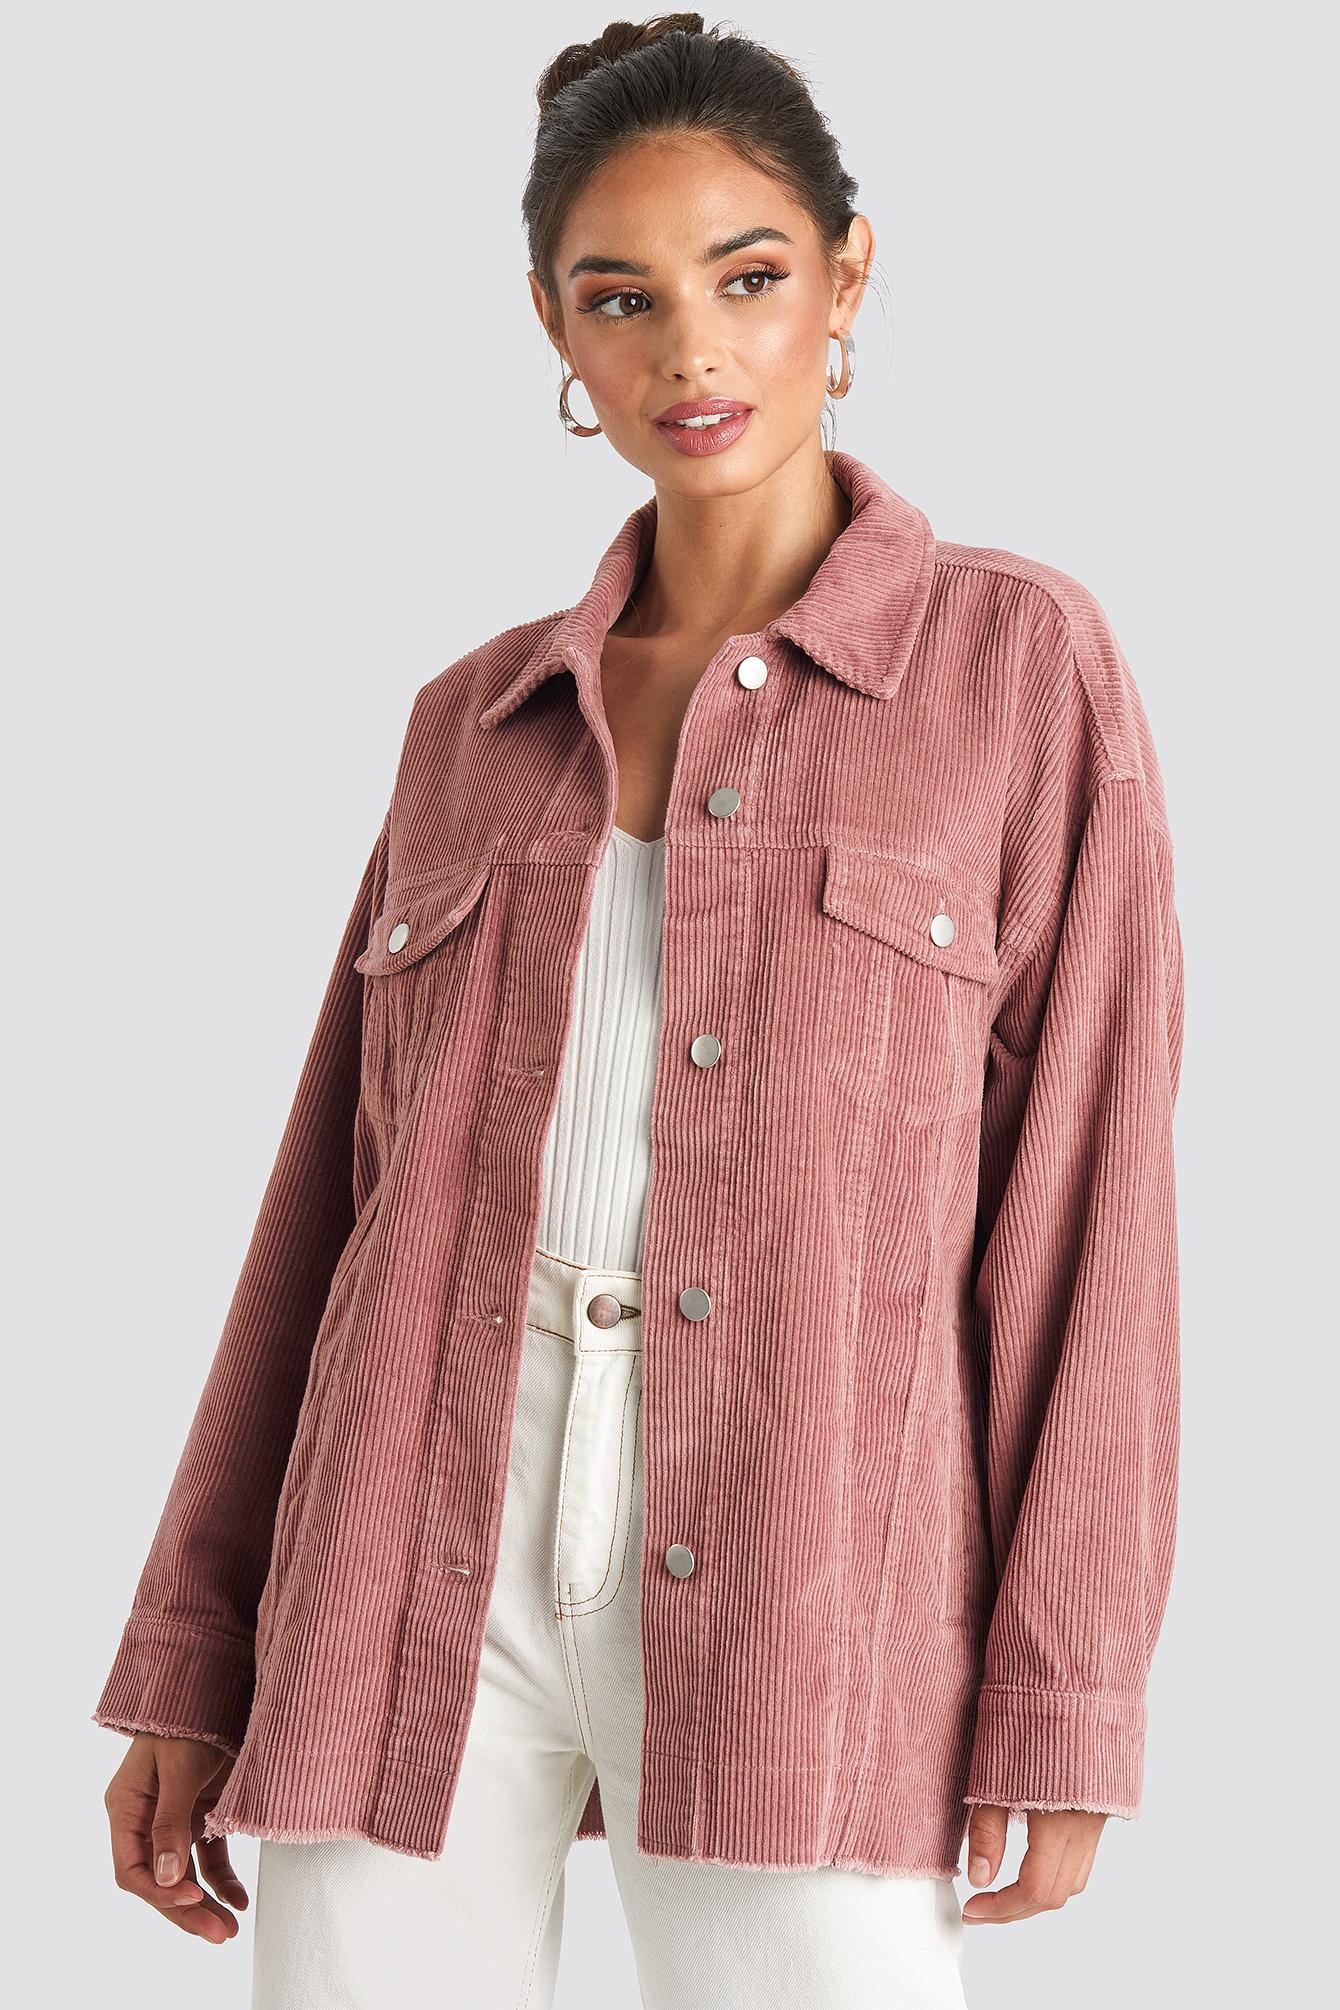 Oversized Raw Hem Corduroy Jacket Rosa by Na Kd Trend